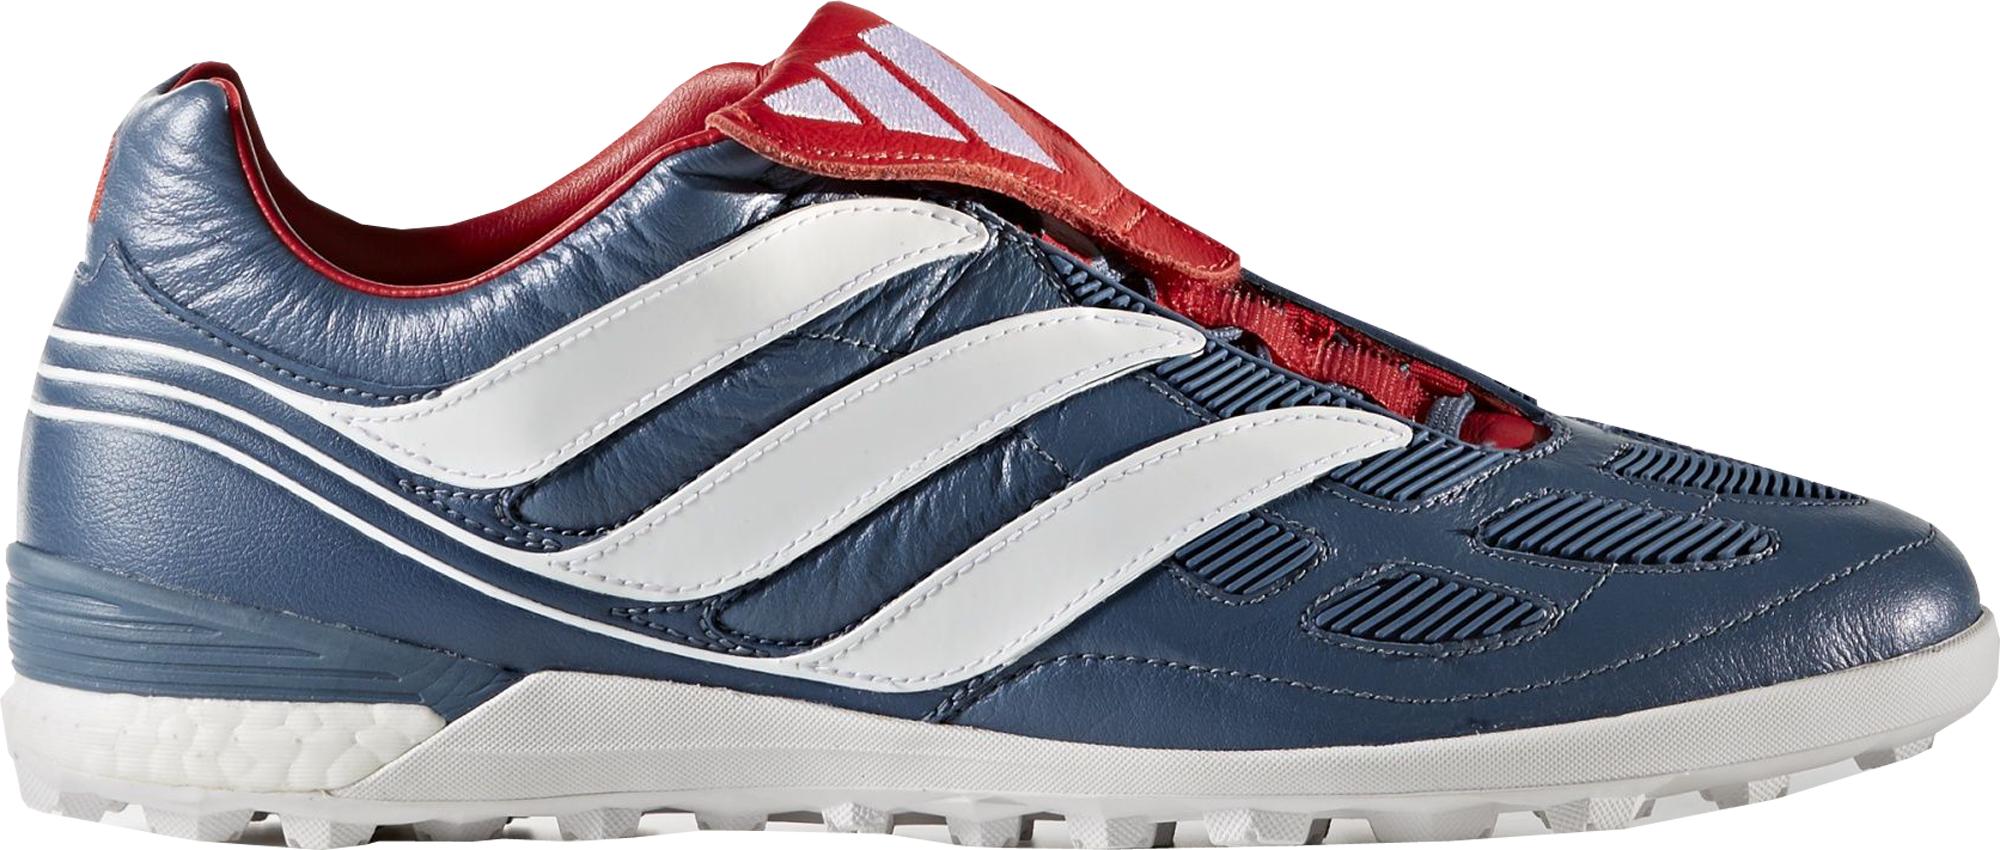 adidas Predator Precision Turf Blue White Red